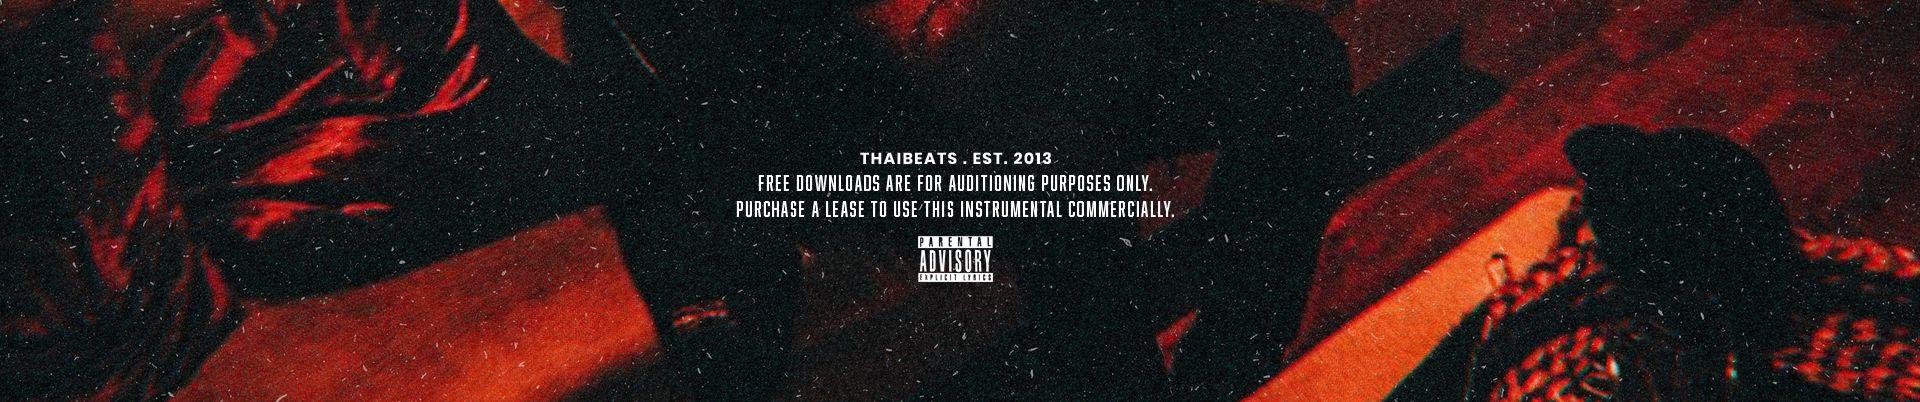 THAIBEATS | Free Listening on SoundCloud